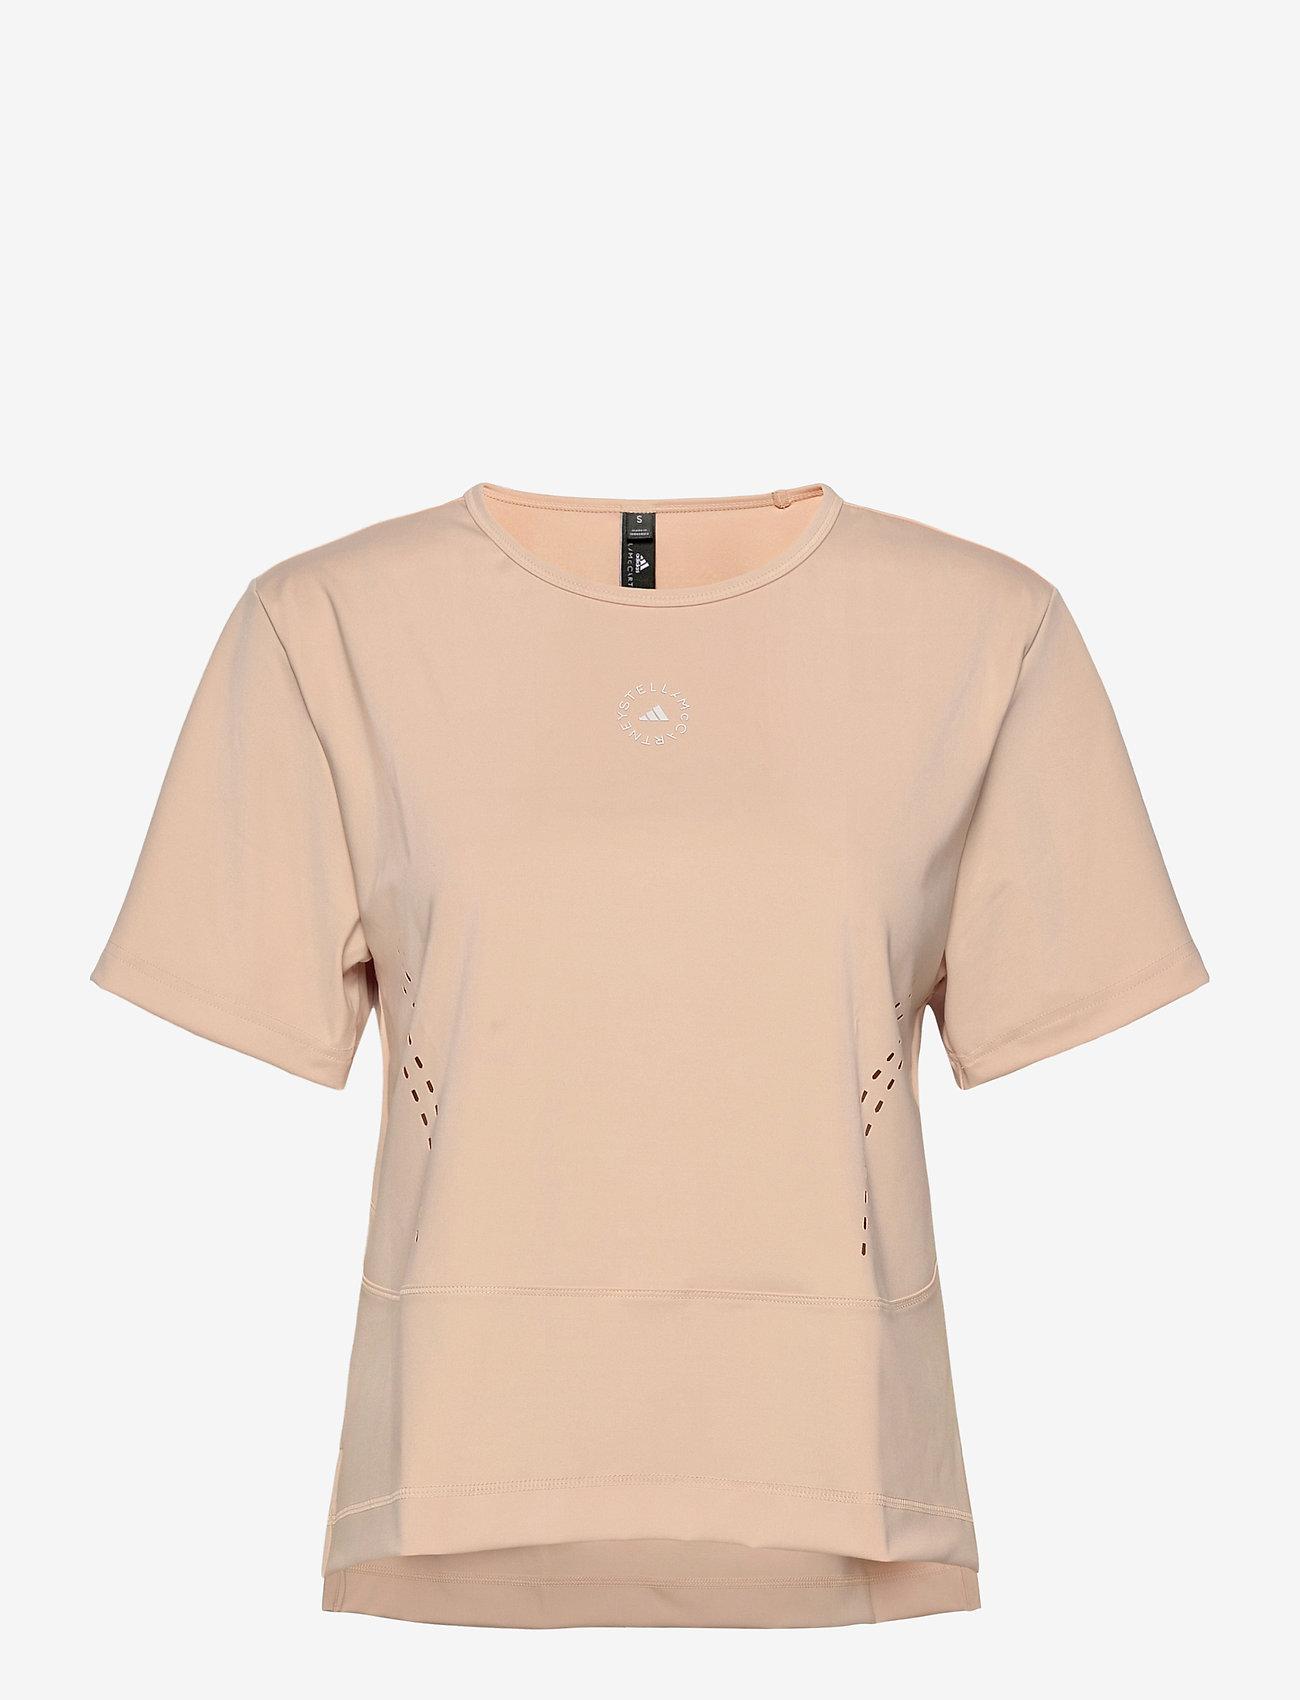 adidas by Stella McCartney - TRUESTR L TEE - t-shirts - sofpow - 1